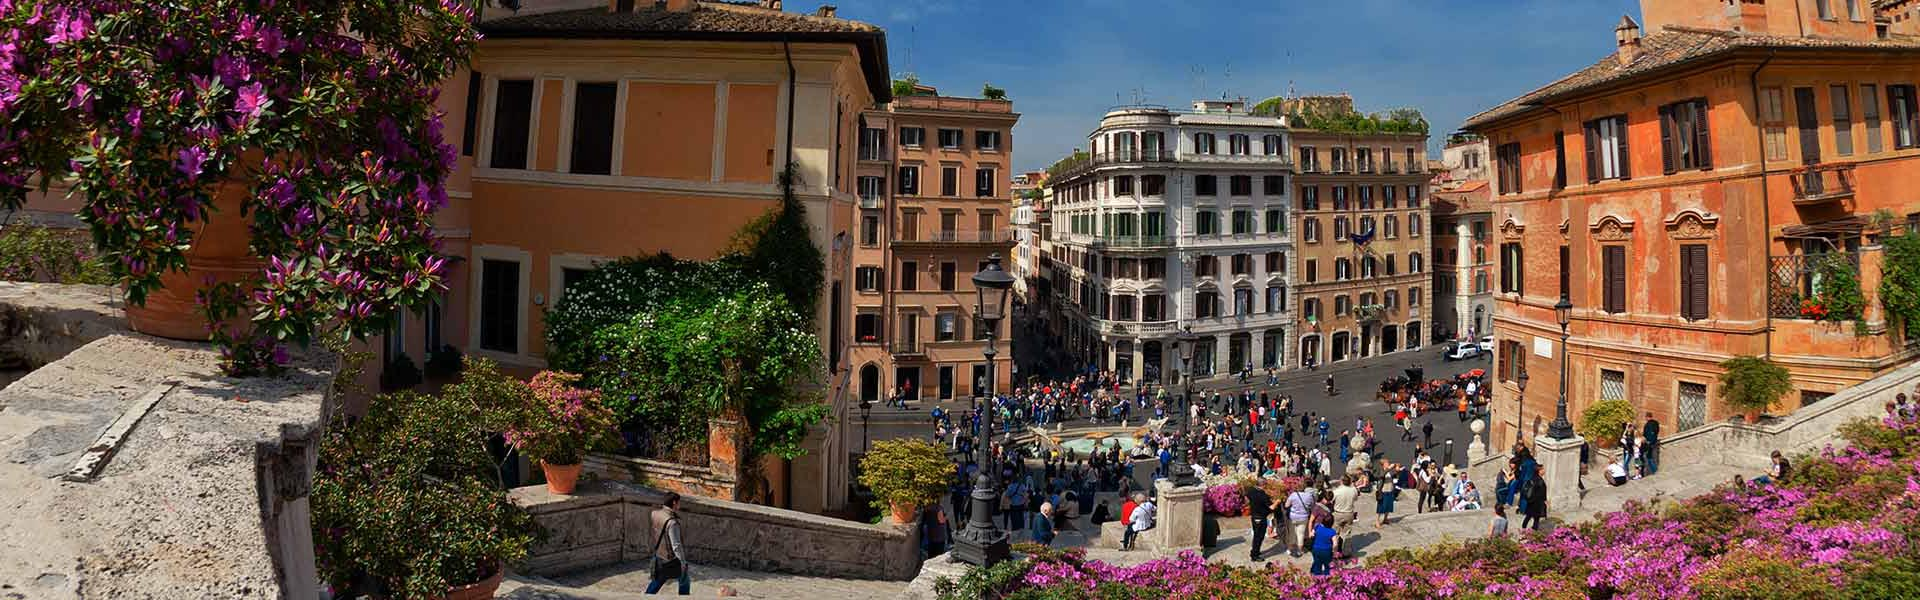 View of the Piazza Di Spagna, Rome